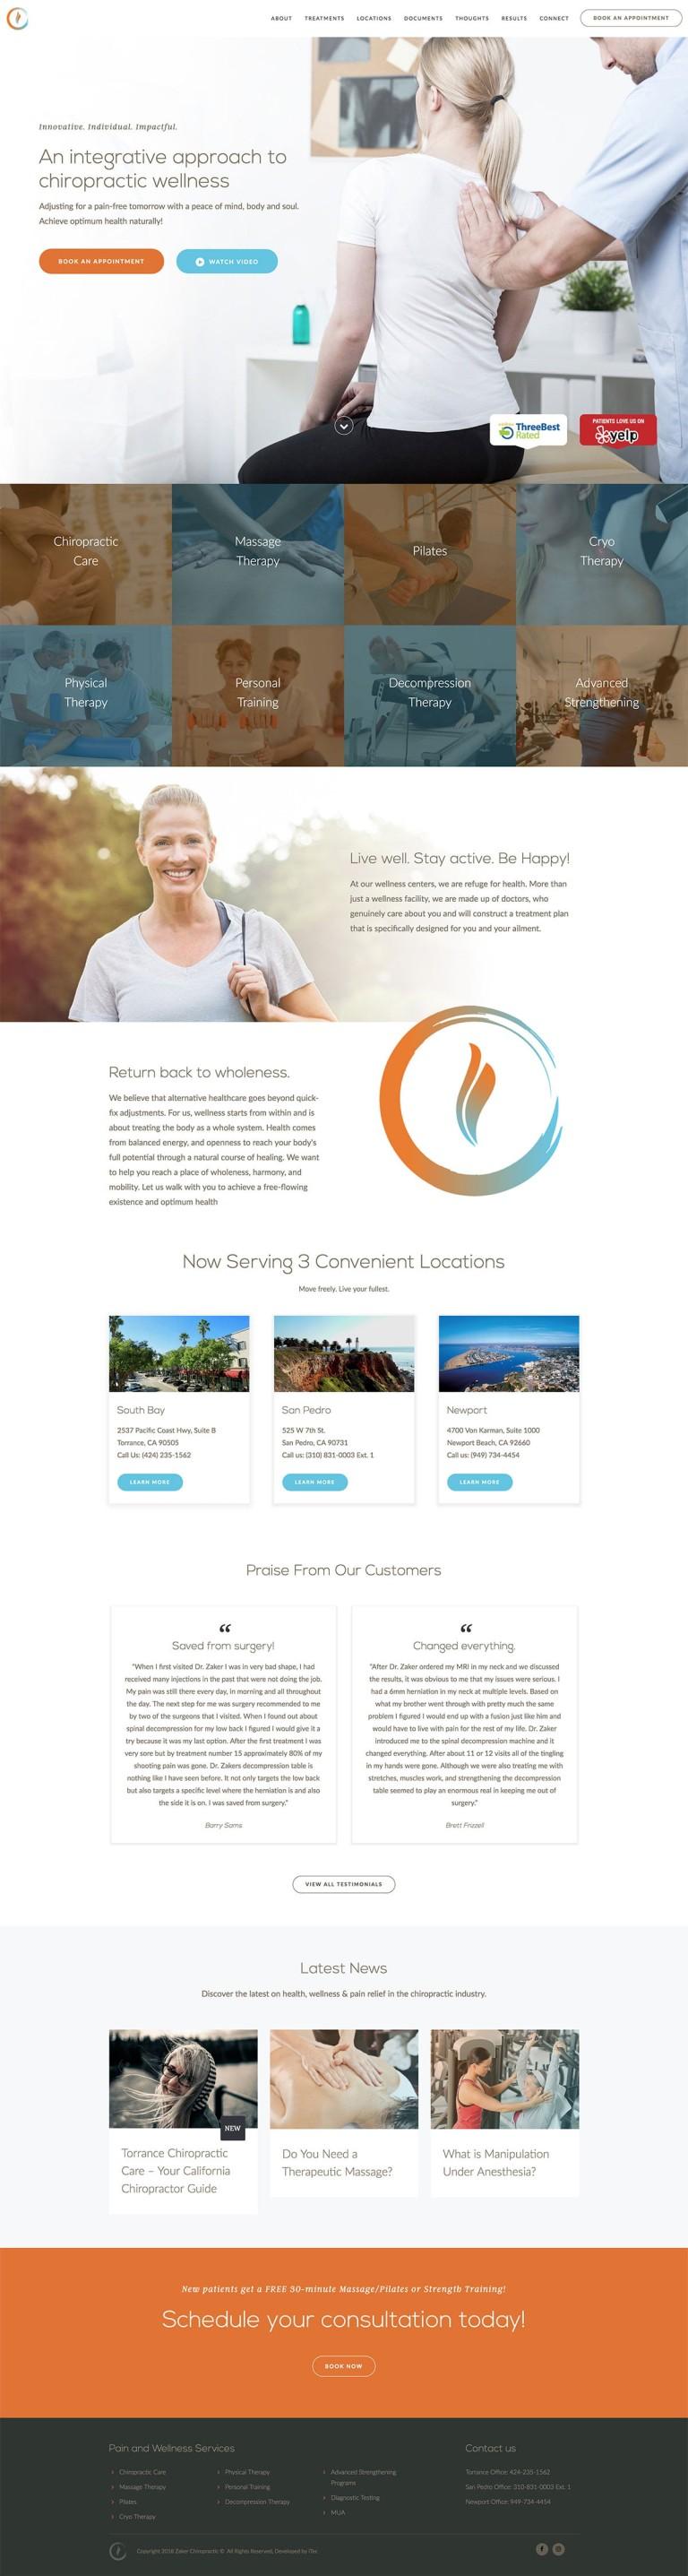 web-design-portfolio-zaker1